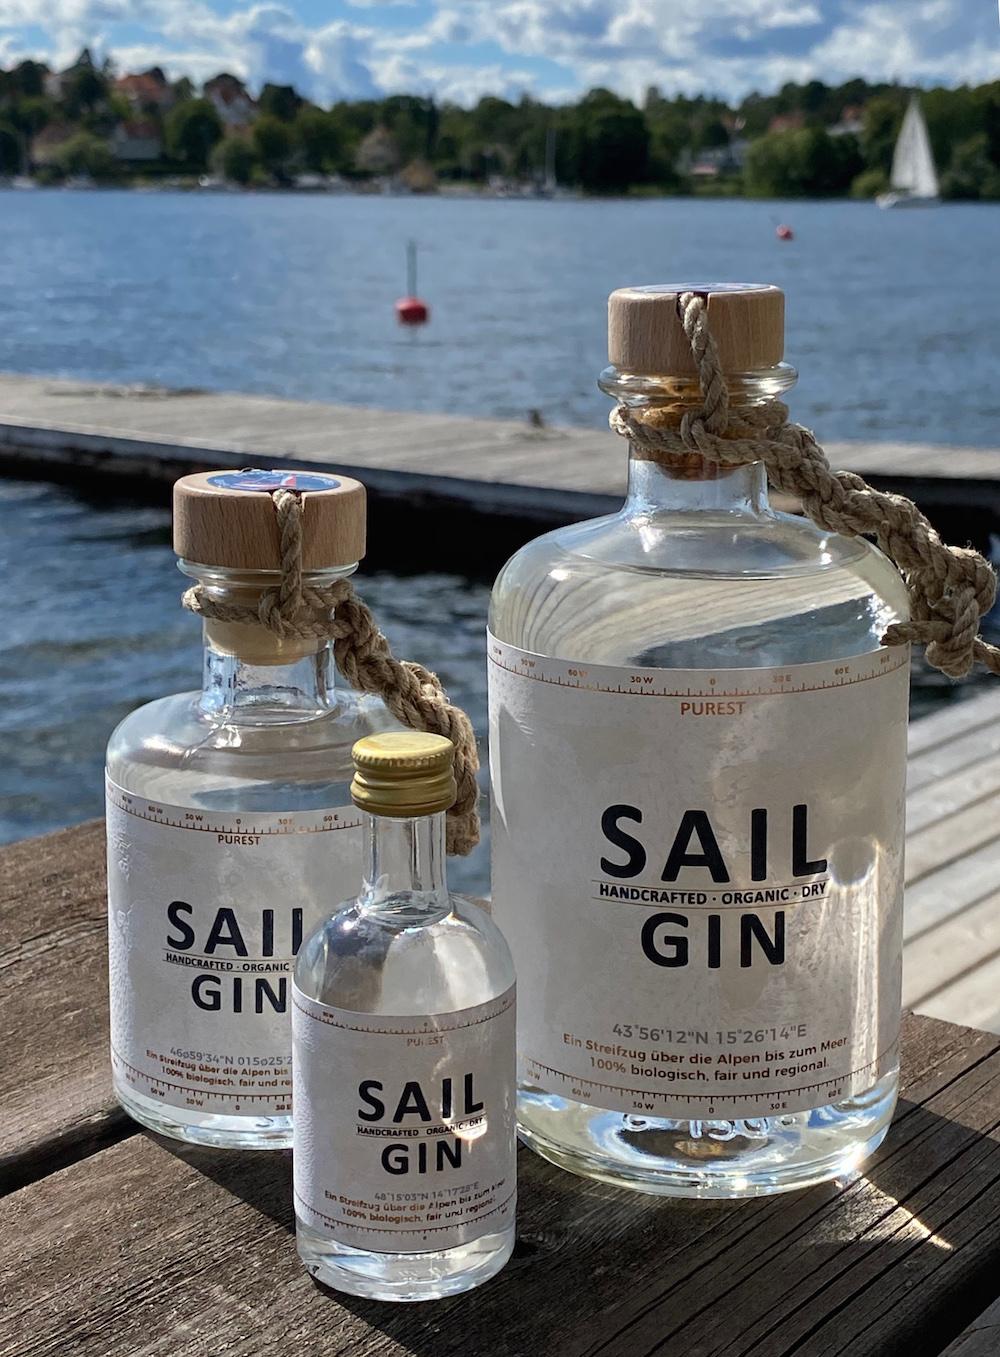 Purest Sail Gin Bottle Sizes Organic Craft Gin Austria